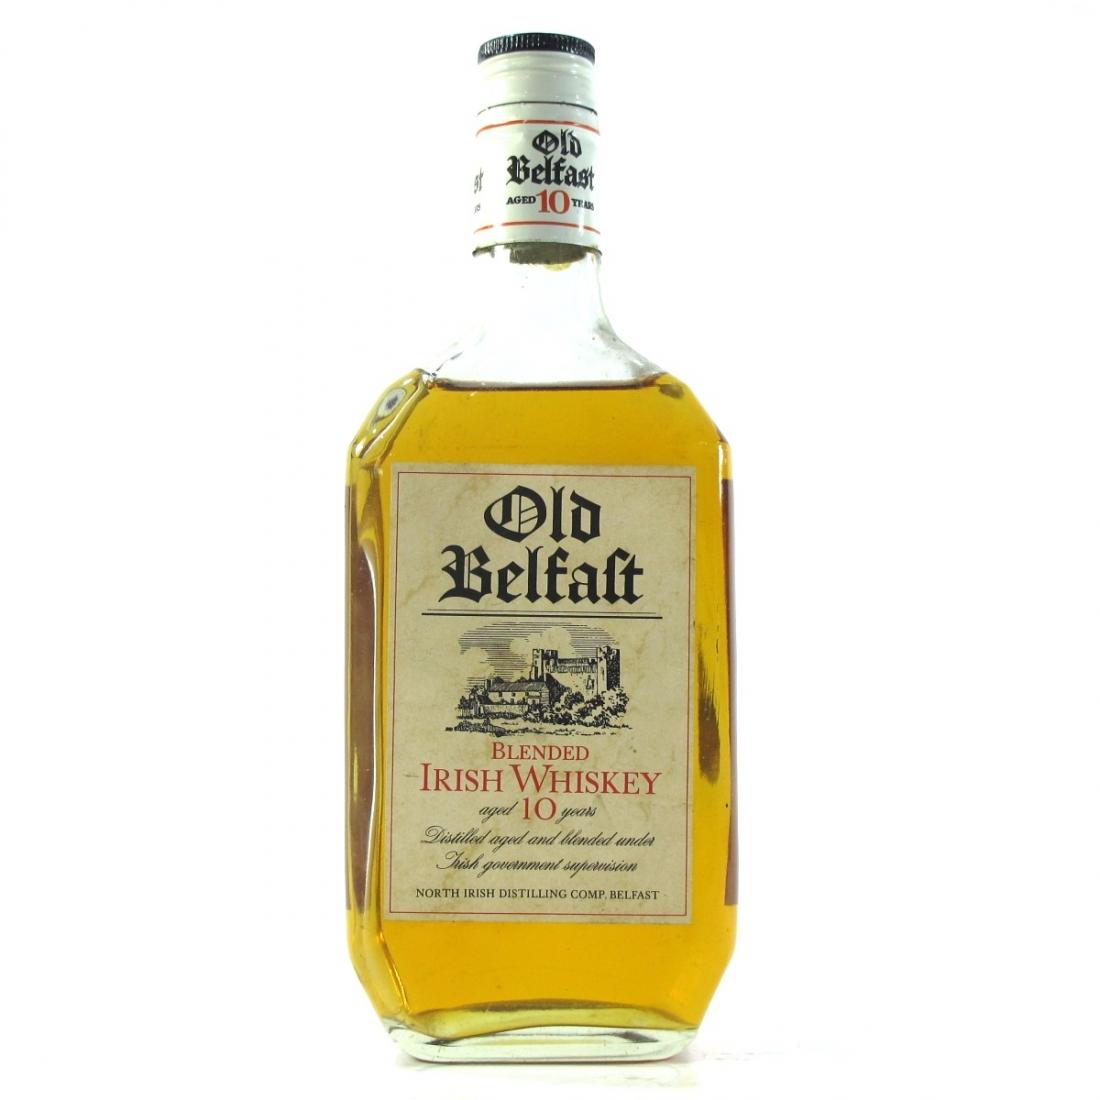 Old Belfast 10 Year Old Irish Whisky 1960s / Hertzberg Import